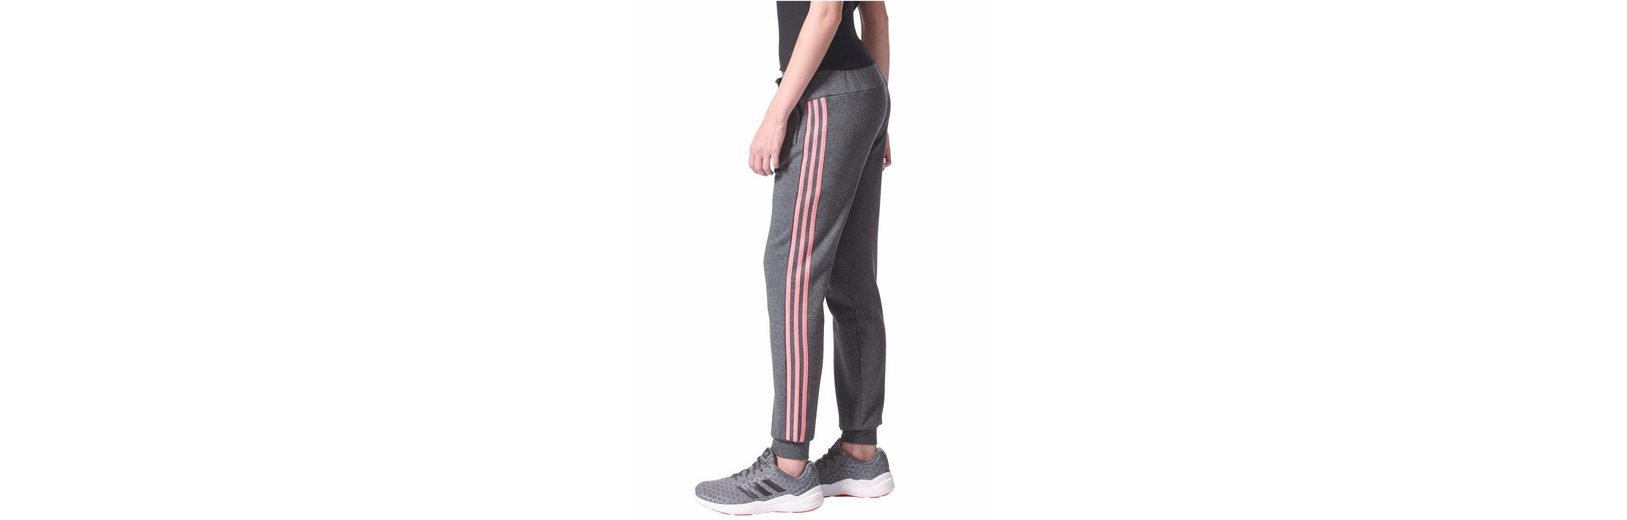 adidas Performance Jogginghose ESSENTIALS 3 STRIPES PANT CUFFED Extrem Verkauf Online oEfpPjCaQ8